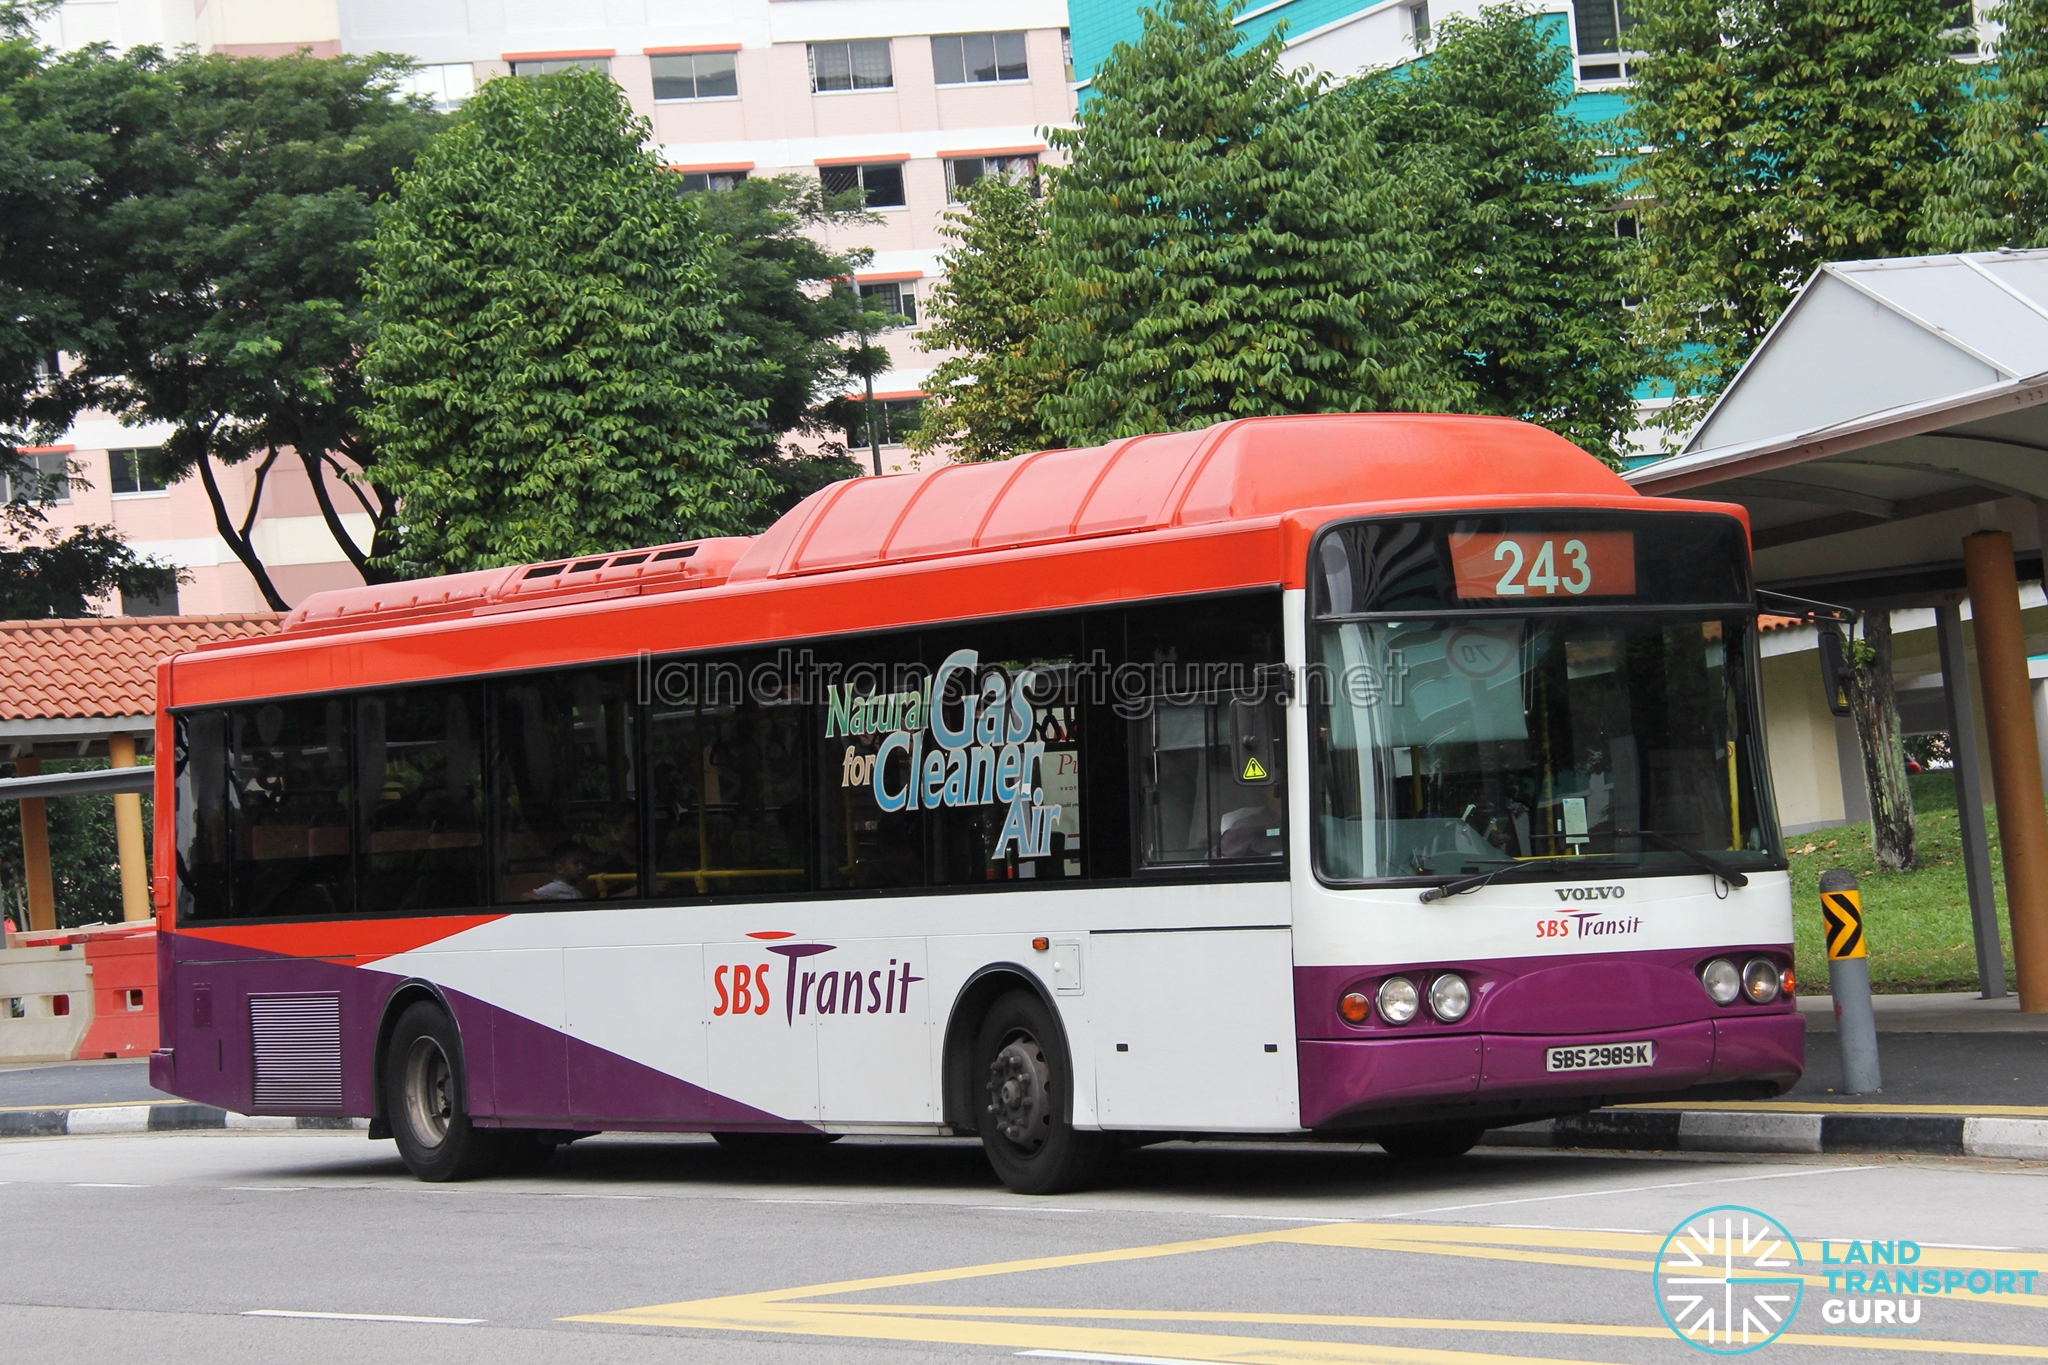 SBS Transit Feeder Bus Service 243G / 243W | Land Transport Guru